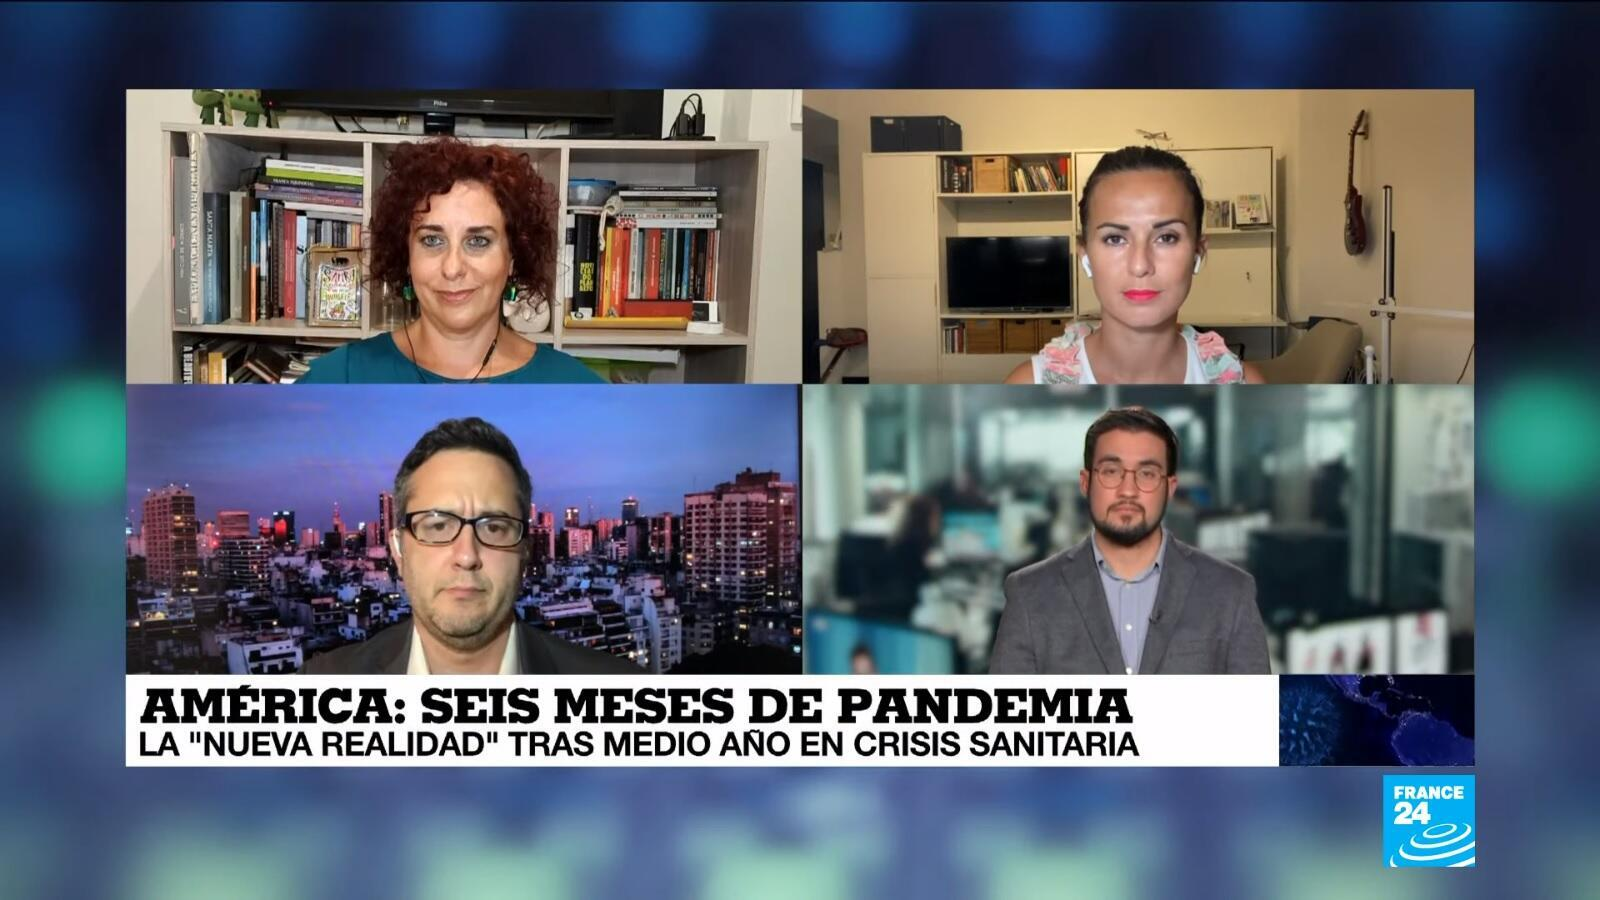 Covid-19 La Semana en América - seis meses de pandemia